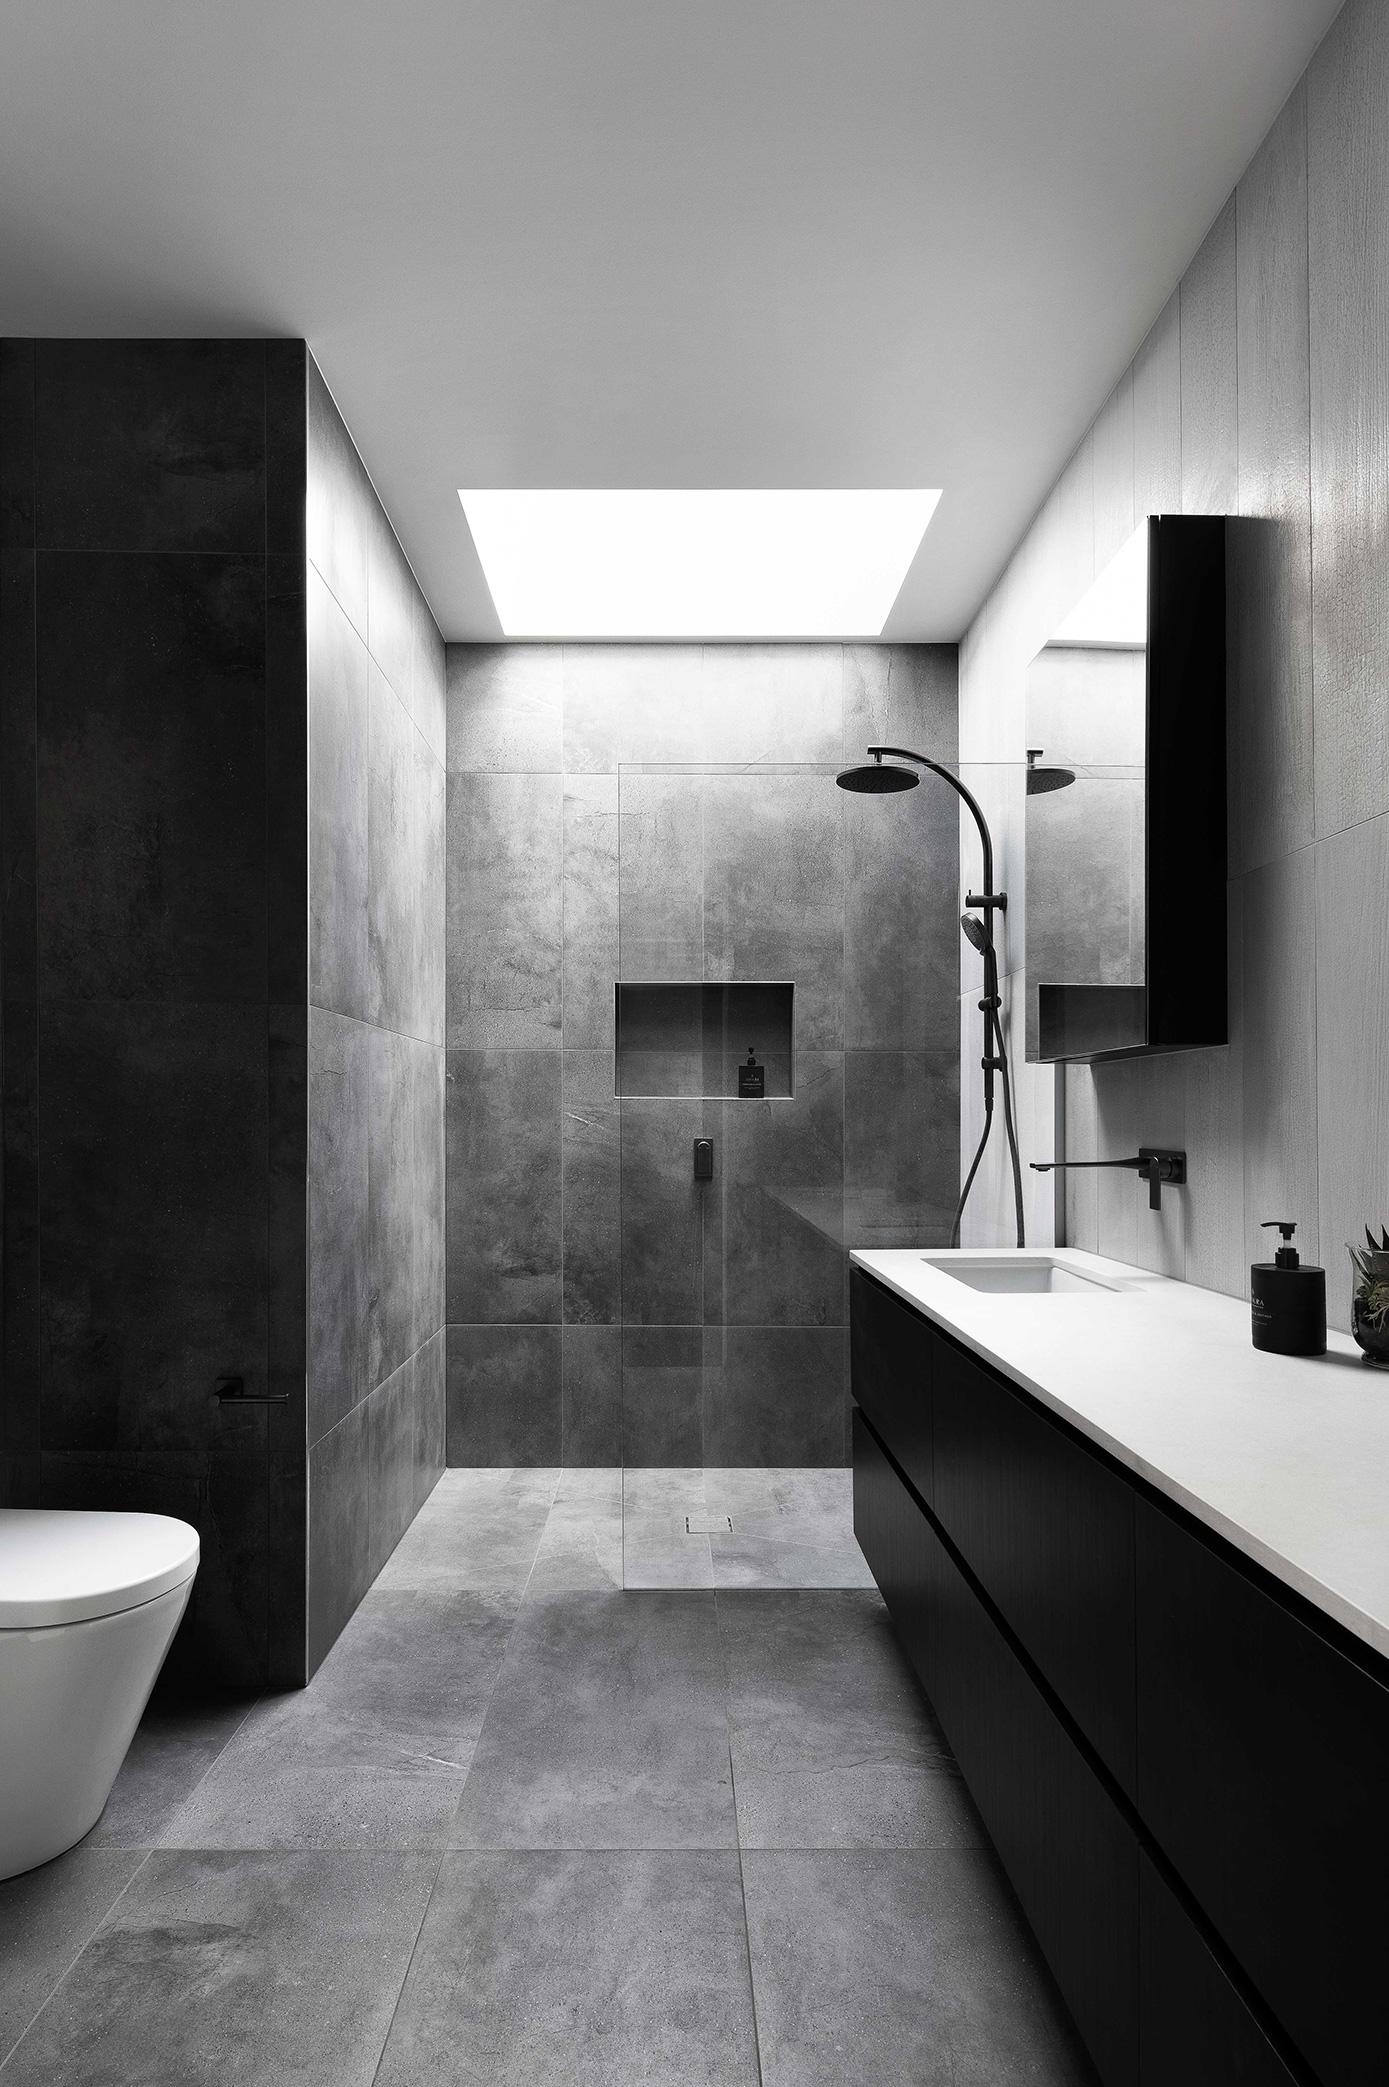 c.kairouz.architects-thornbury-townhouses-interior-bathroom-master